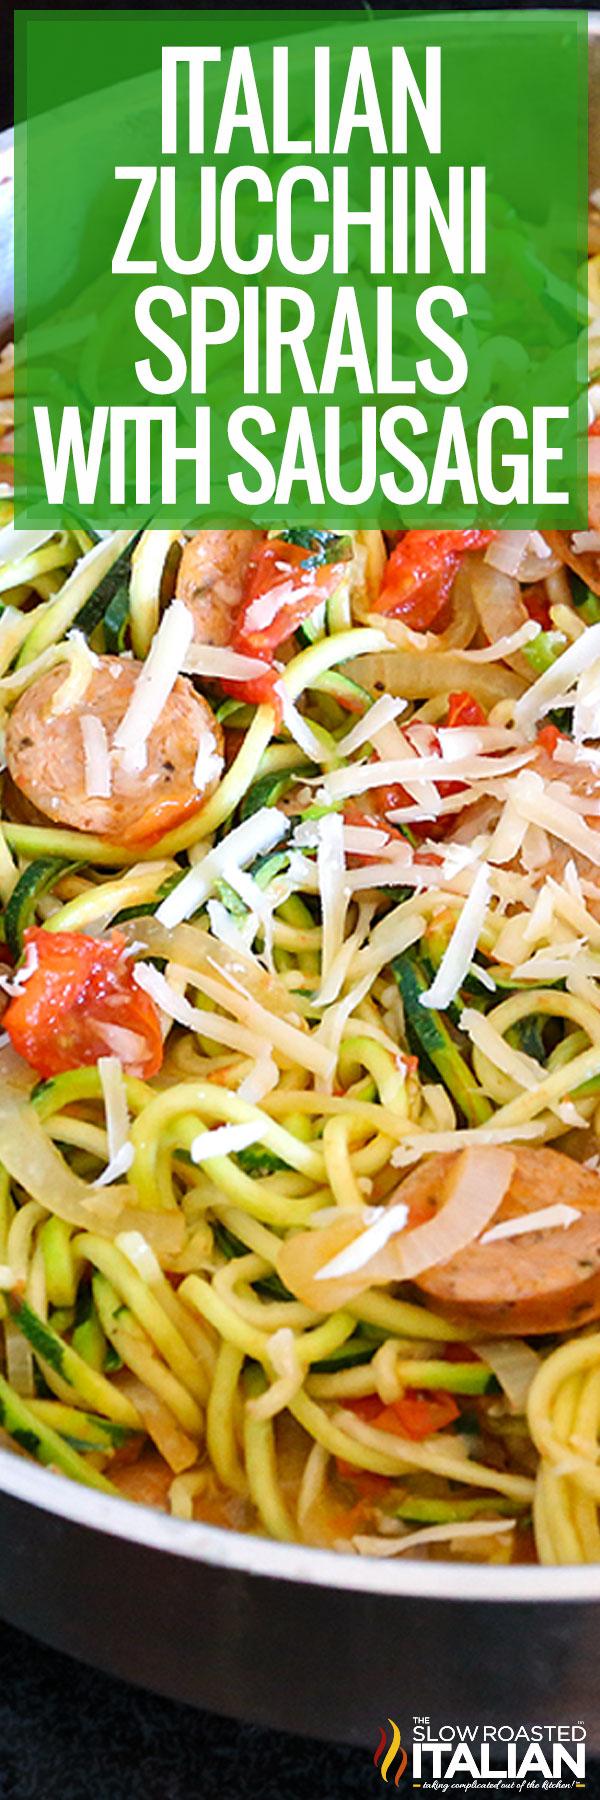 Italian Zucchini Spirals with Sausage closeup